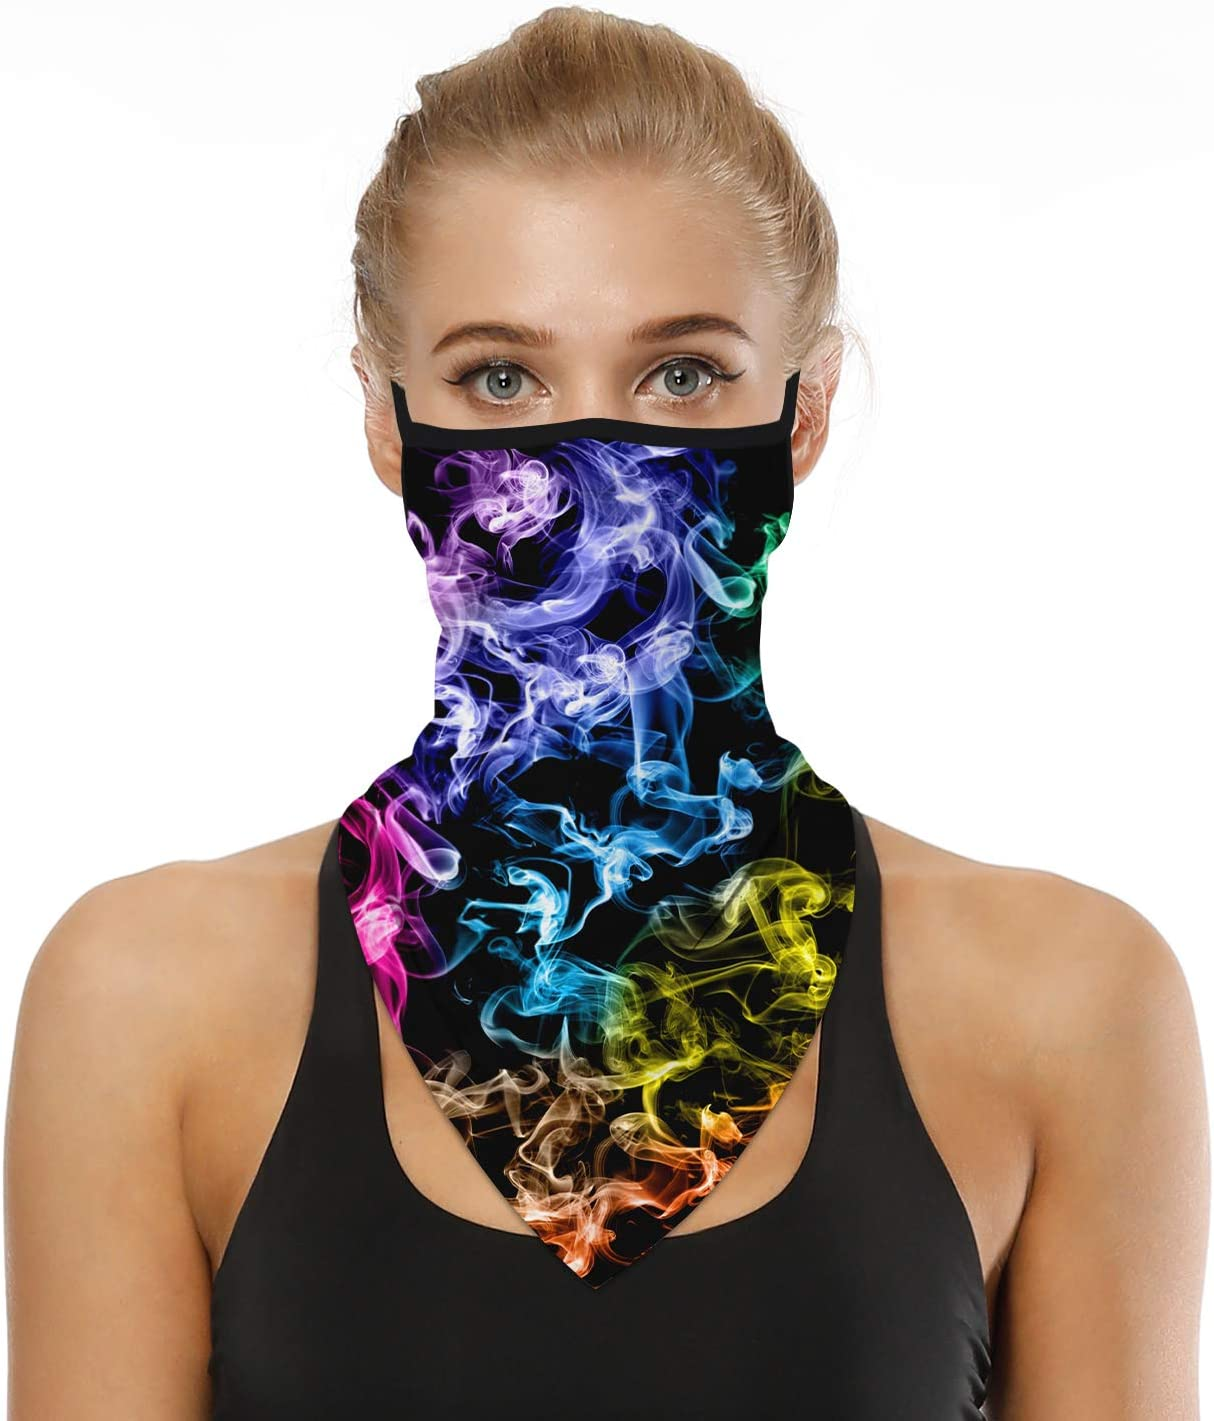 Timemory Unisex Seamless Triangle Face Rave Bandana Neck Gaiter Tube Cover Motorcycle Face Bandana for Women Men Face Scarf #Print6